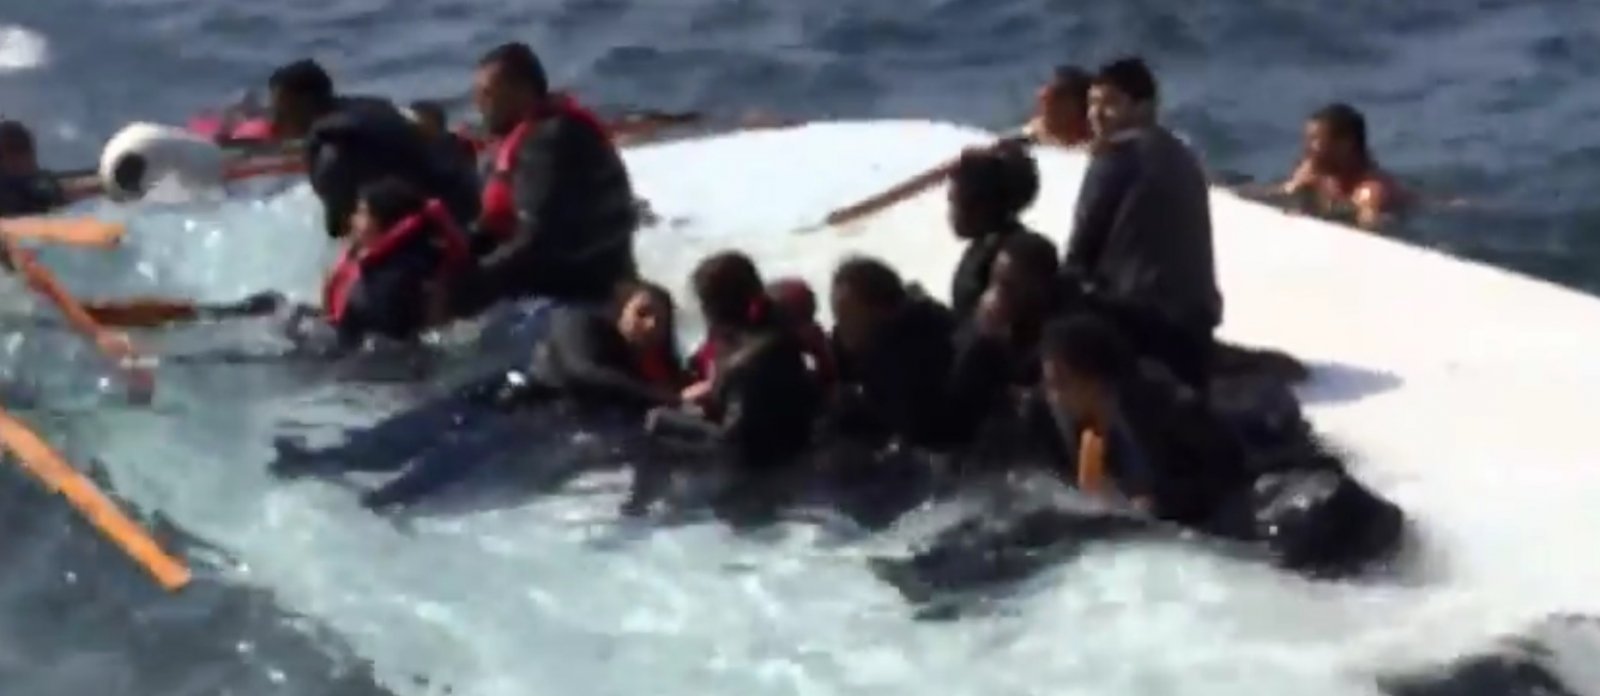 Rhodes MIgrant boat shipwreck